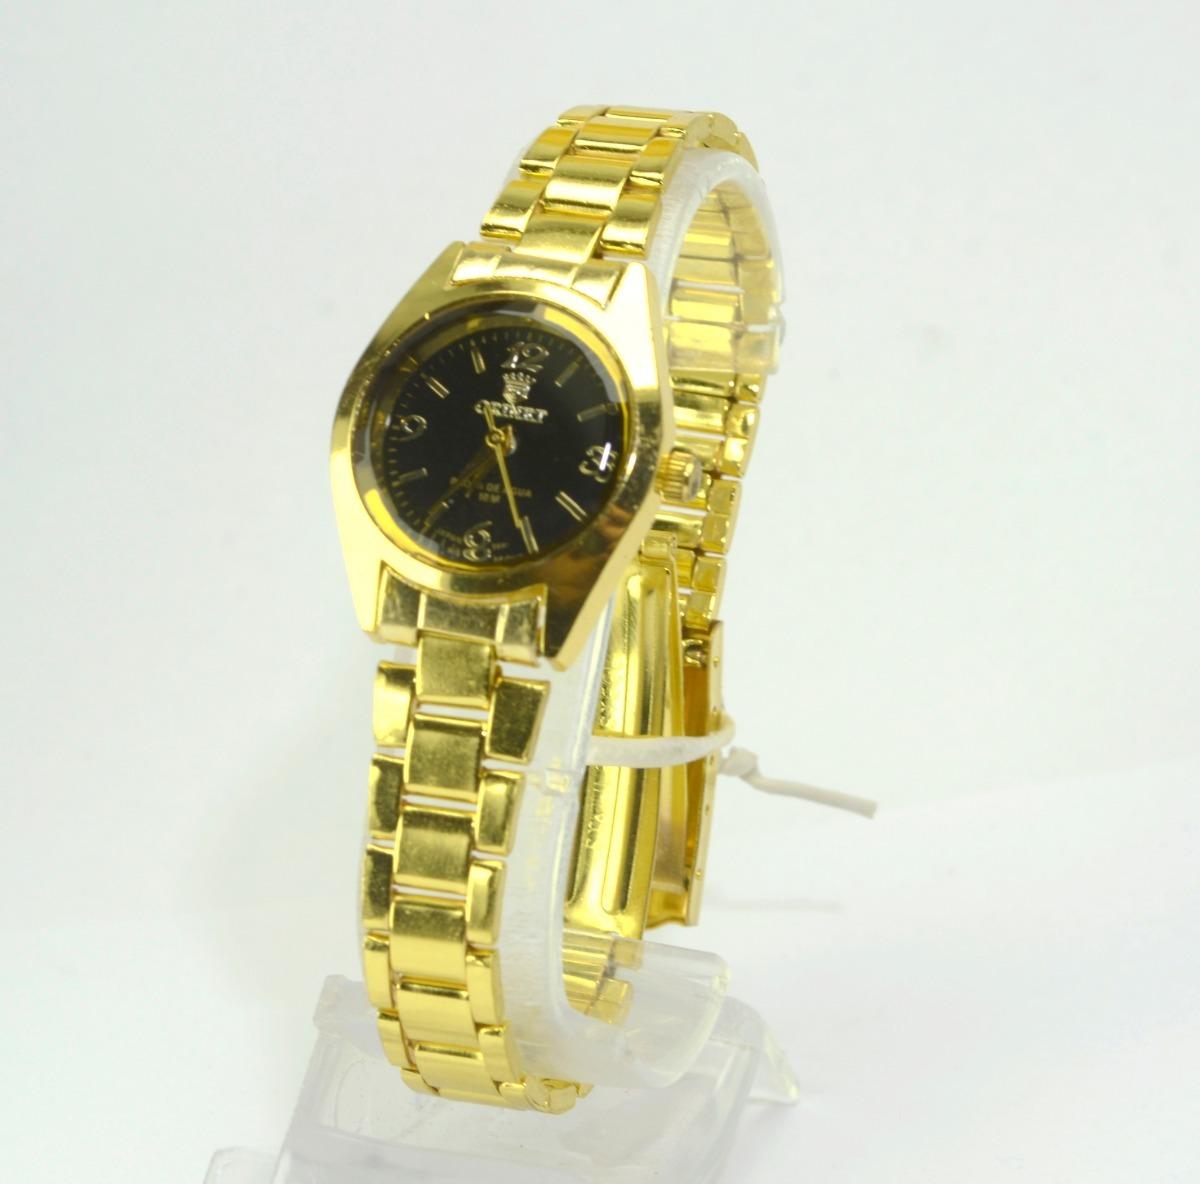 d3e55fbdffa relógio feminino de pulso dourado varias cor orinet pequeno. Carregando zoom .